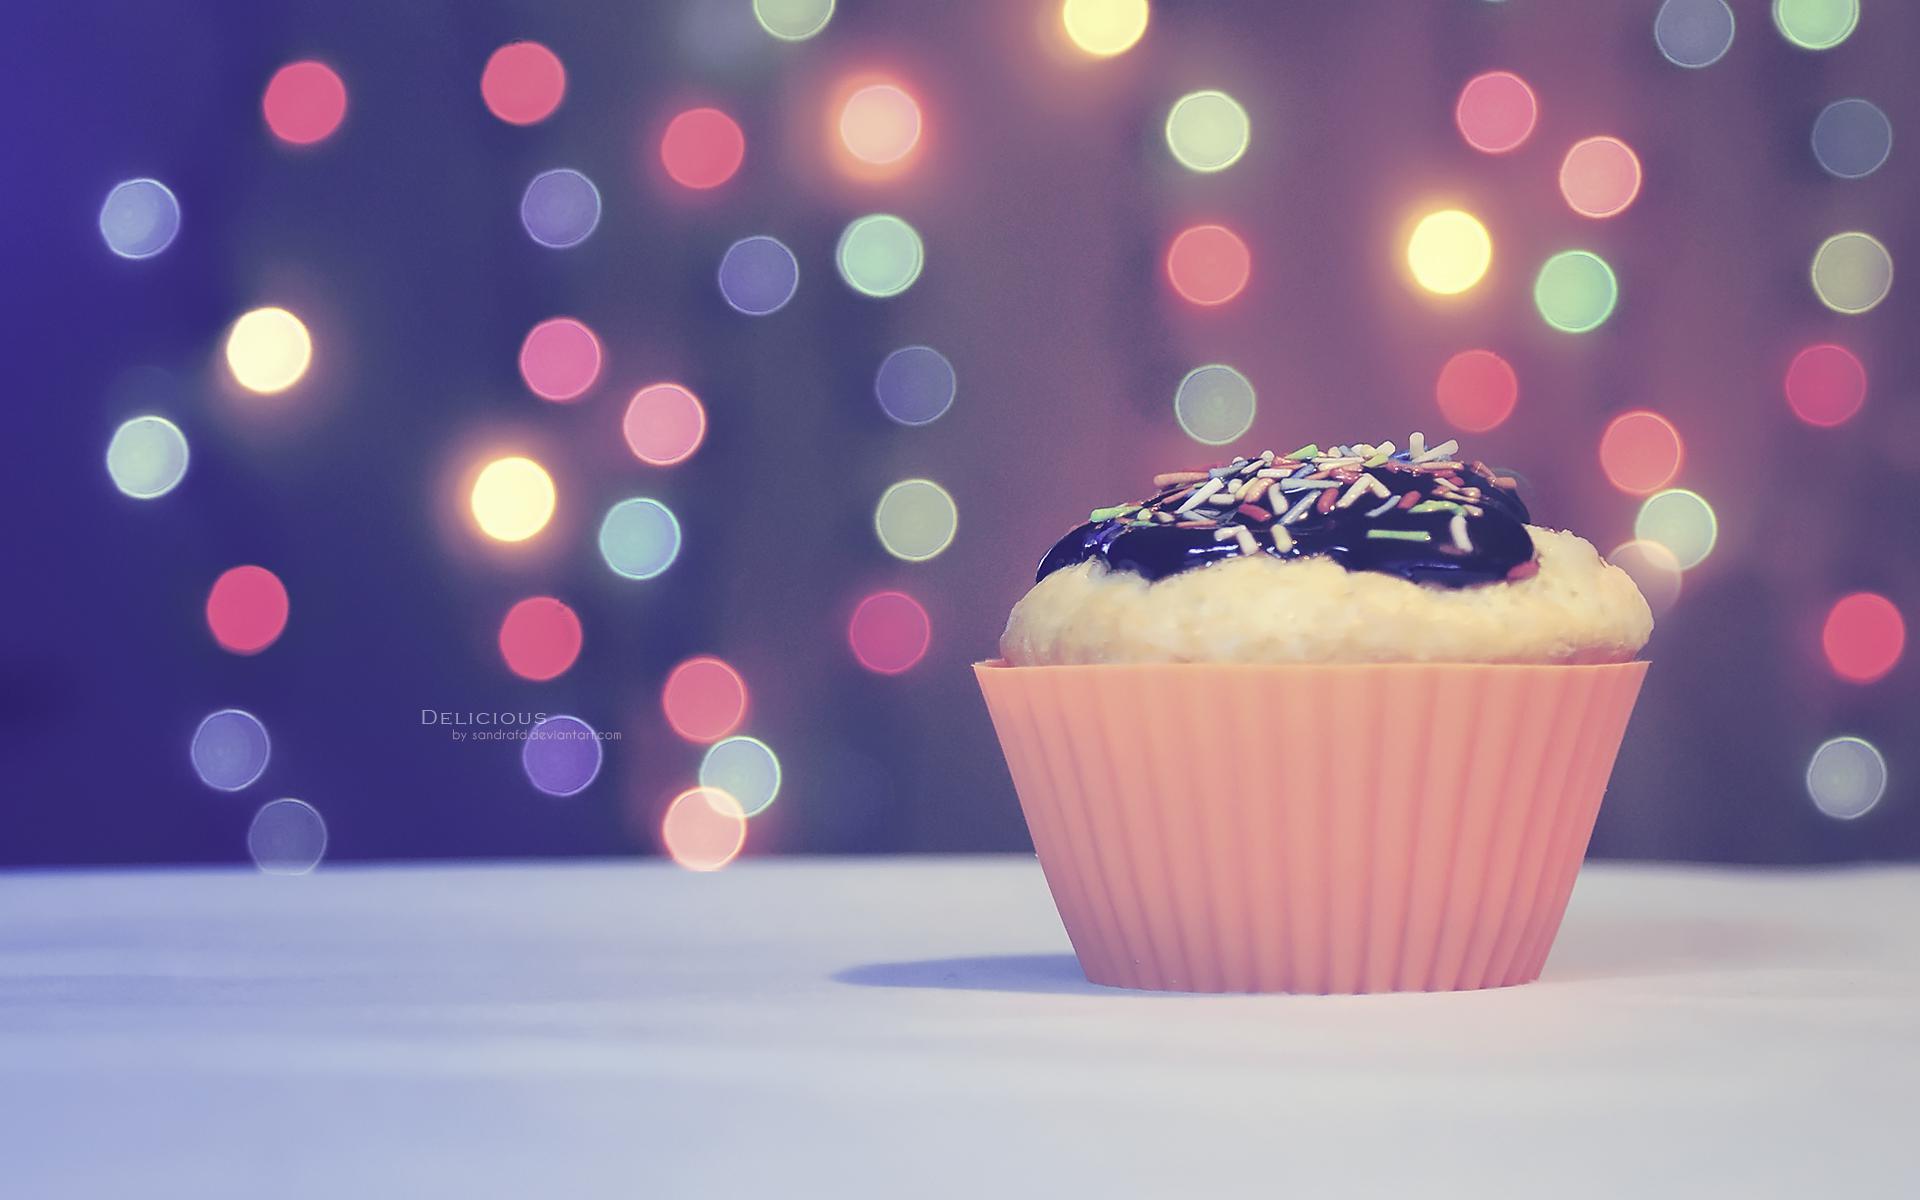 cupcake images